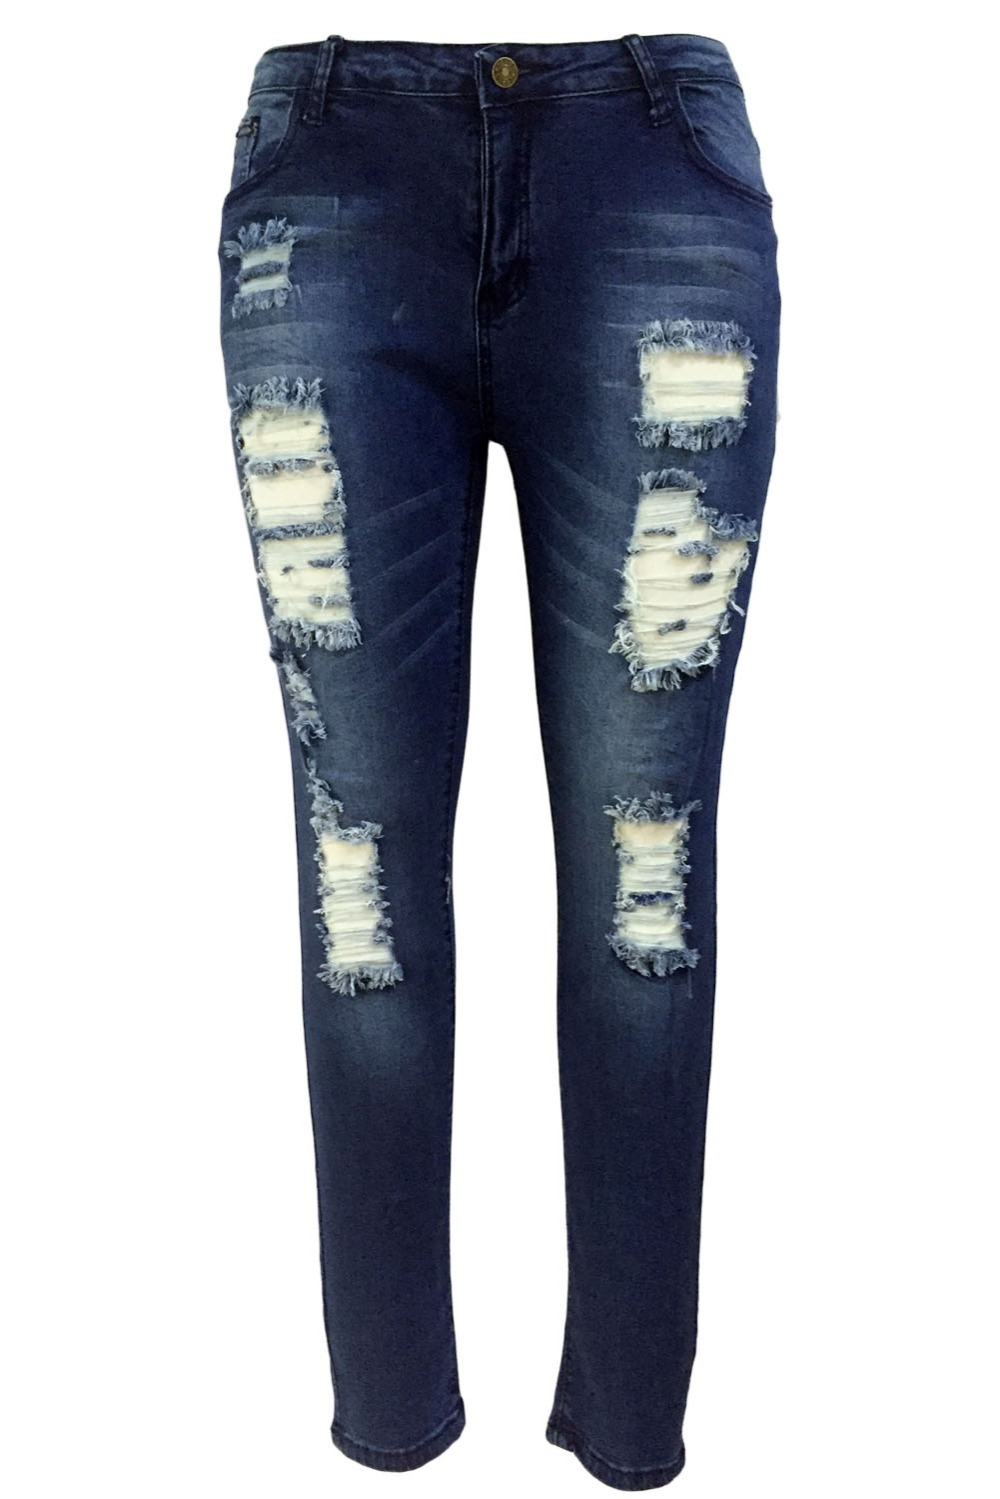 Dark-Sandblast-Wash-Denim-Destroyed-Skinny-Jeans-LC78659-5-3